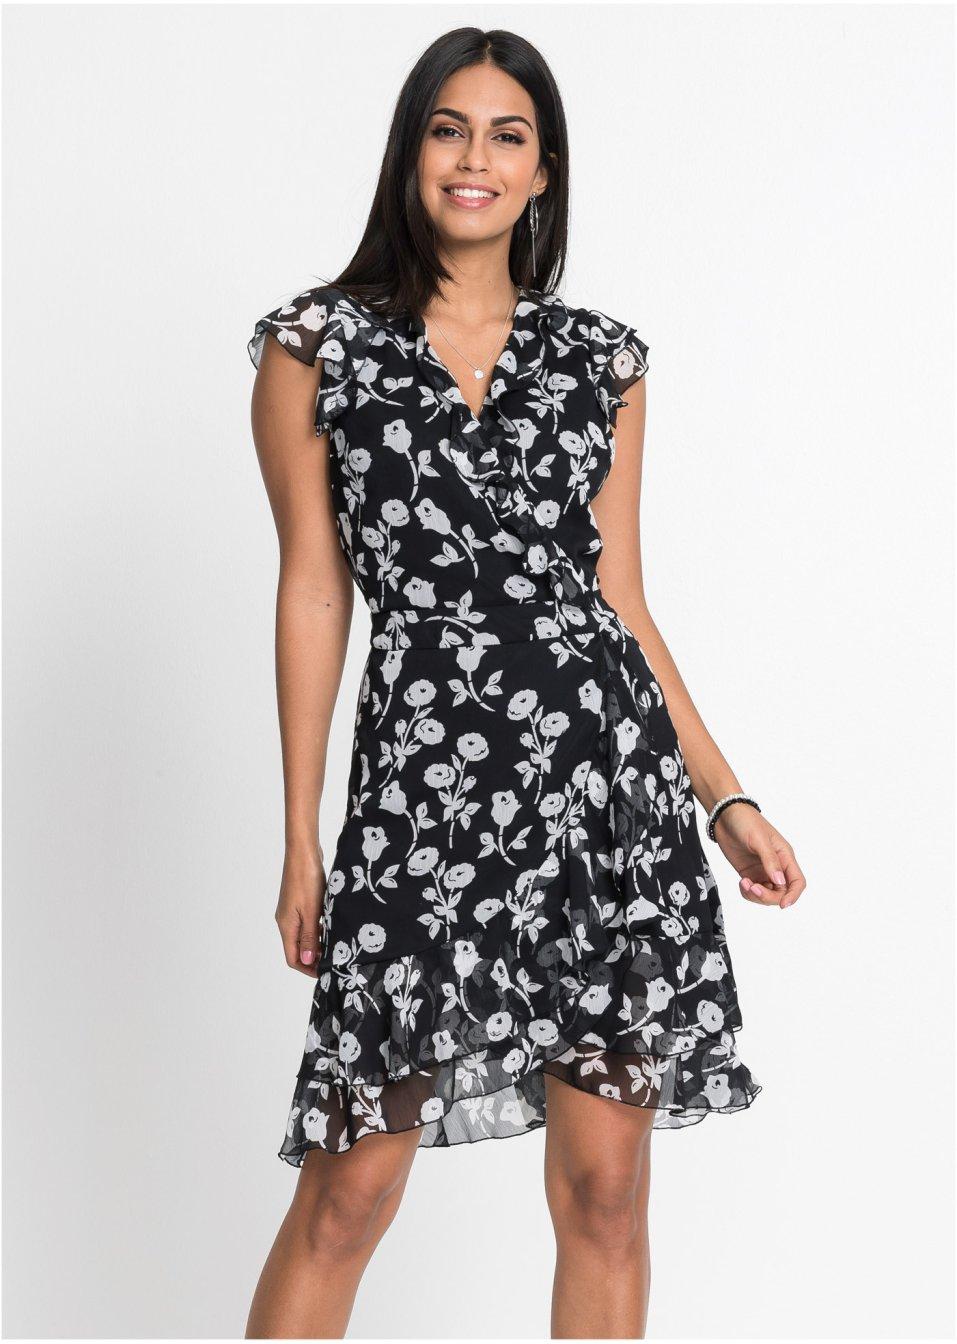 Kleid schwarz/weiss bedruckt - Damen - bonprix.ch